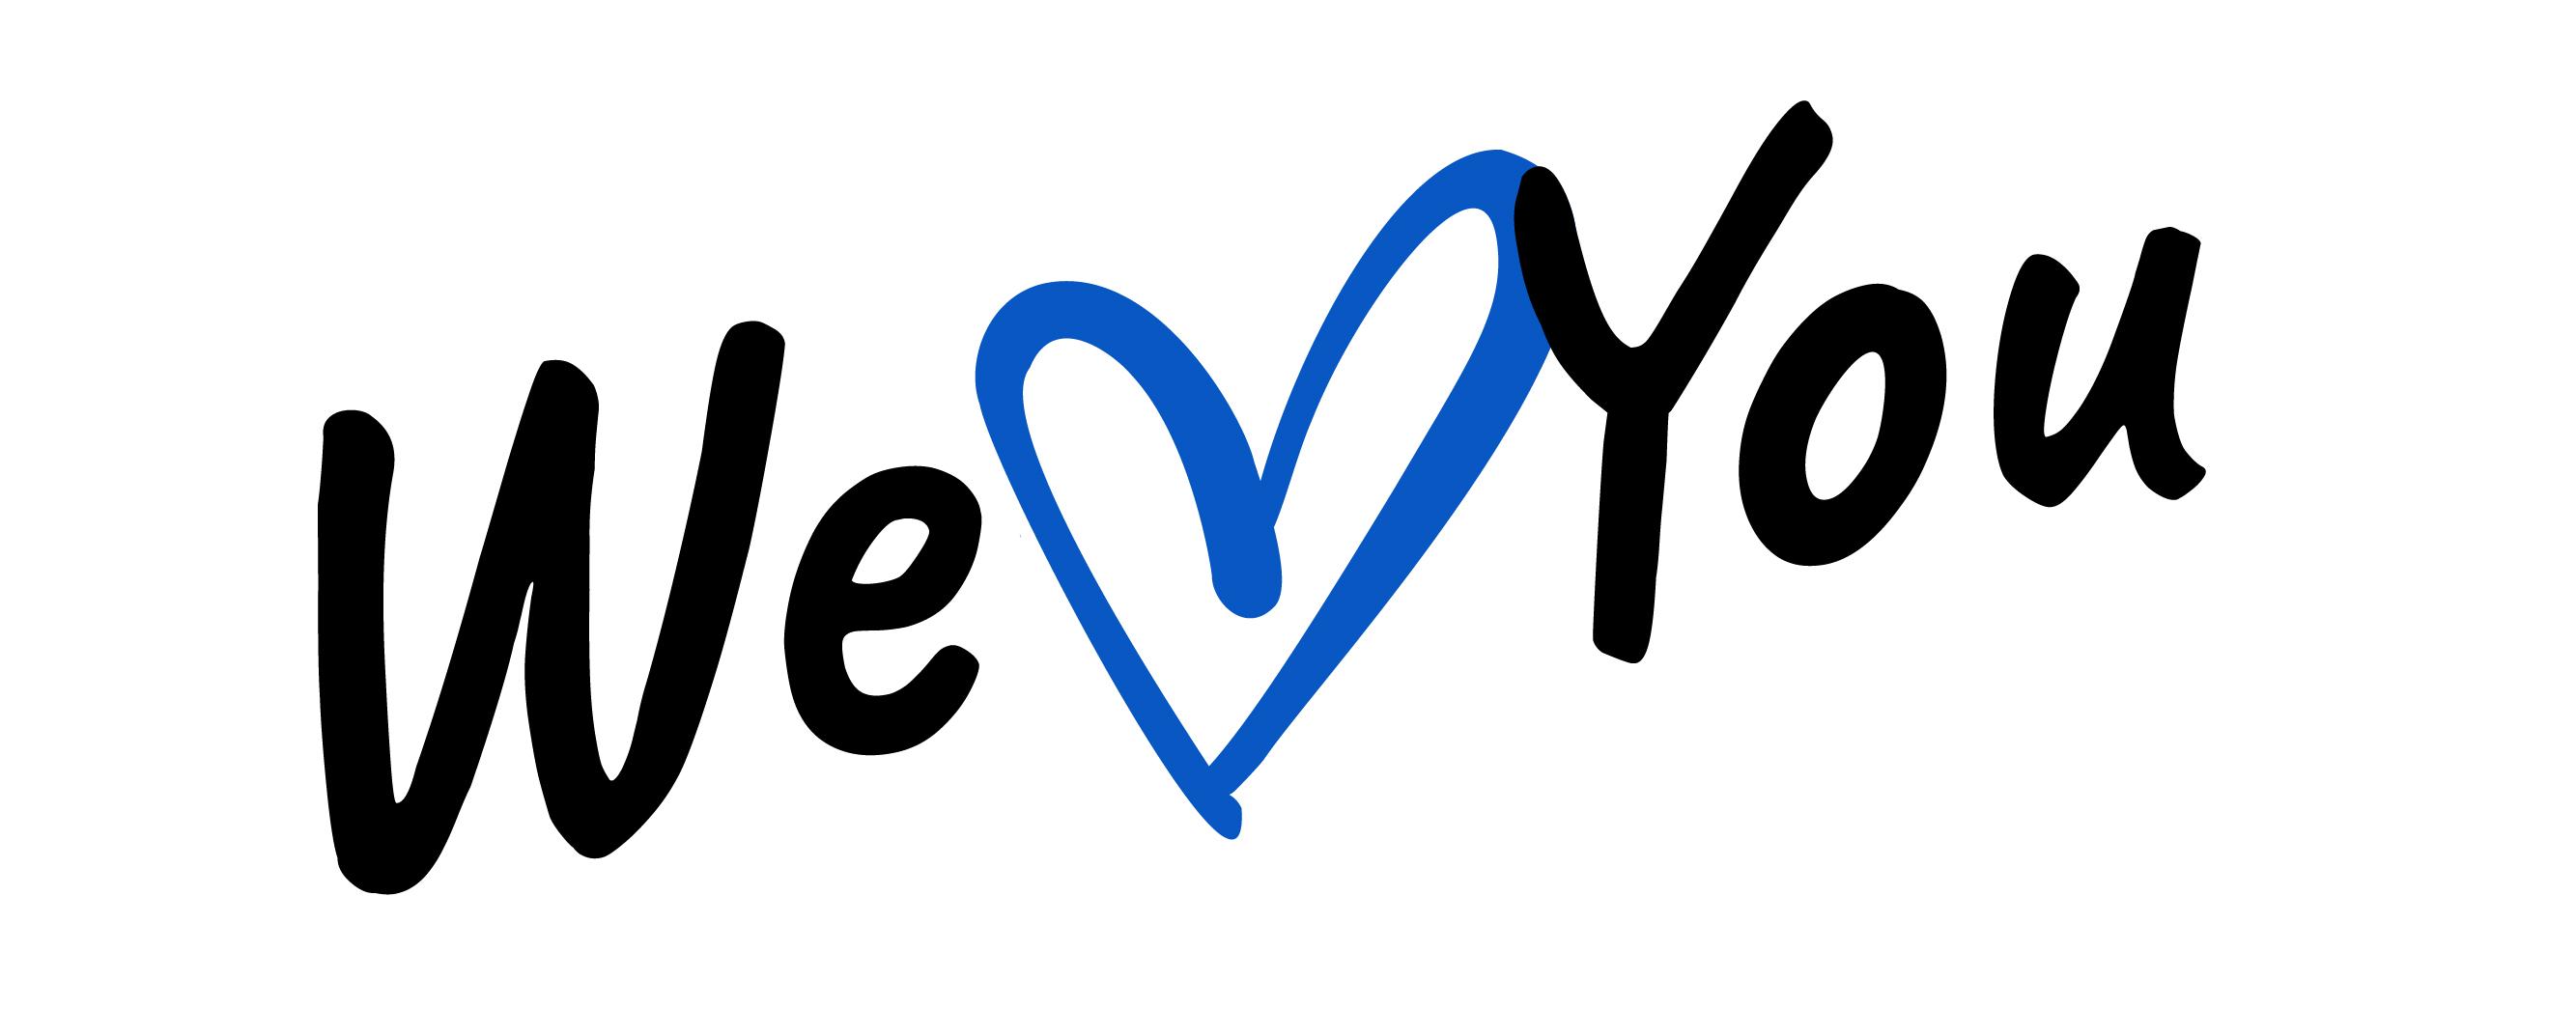 We love you logo.